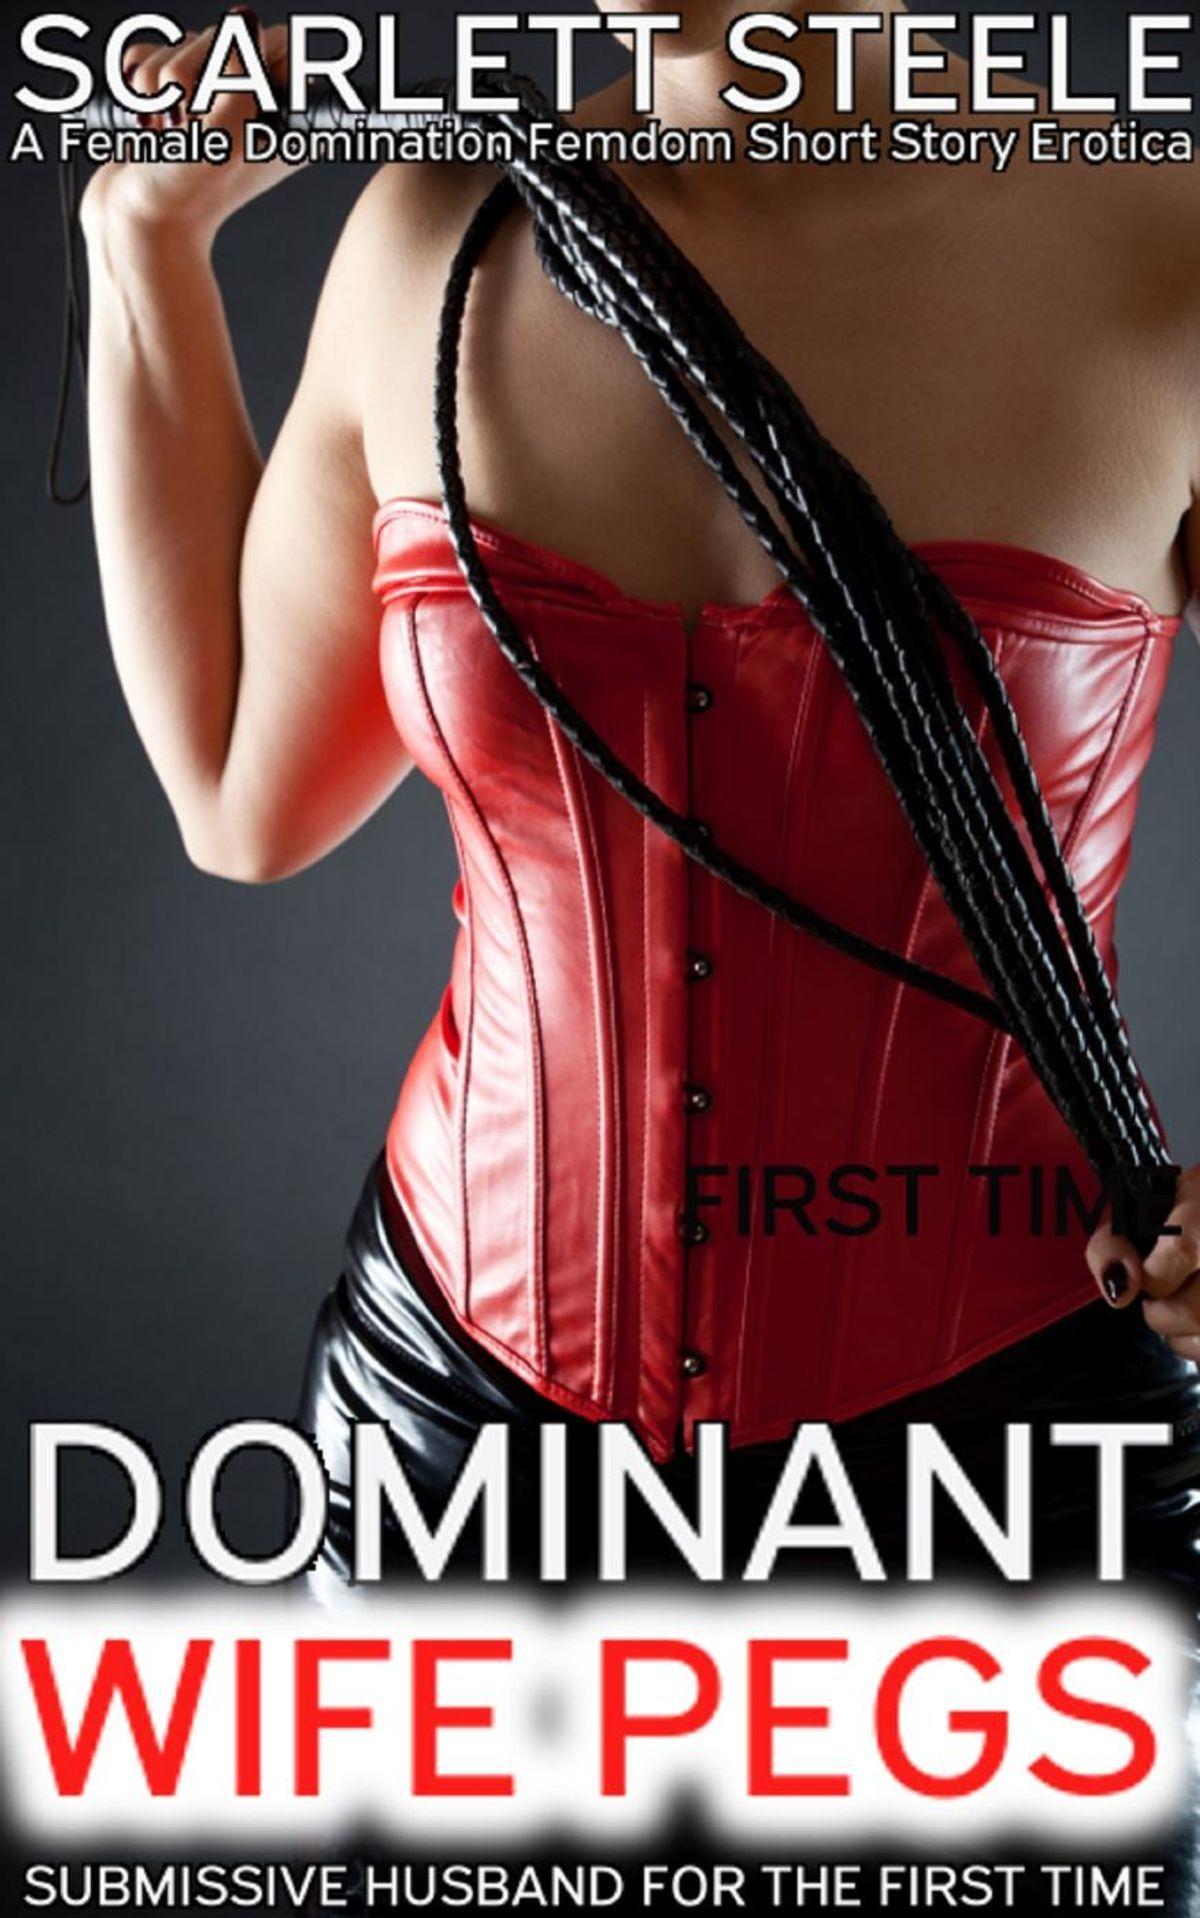 Husband blog submissive Submissive Husband